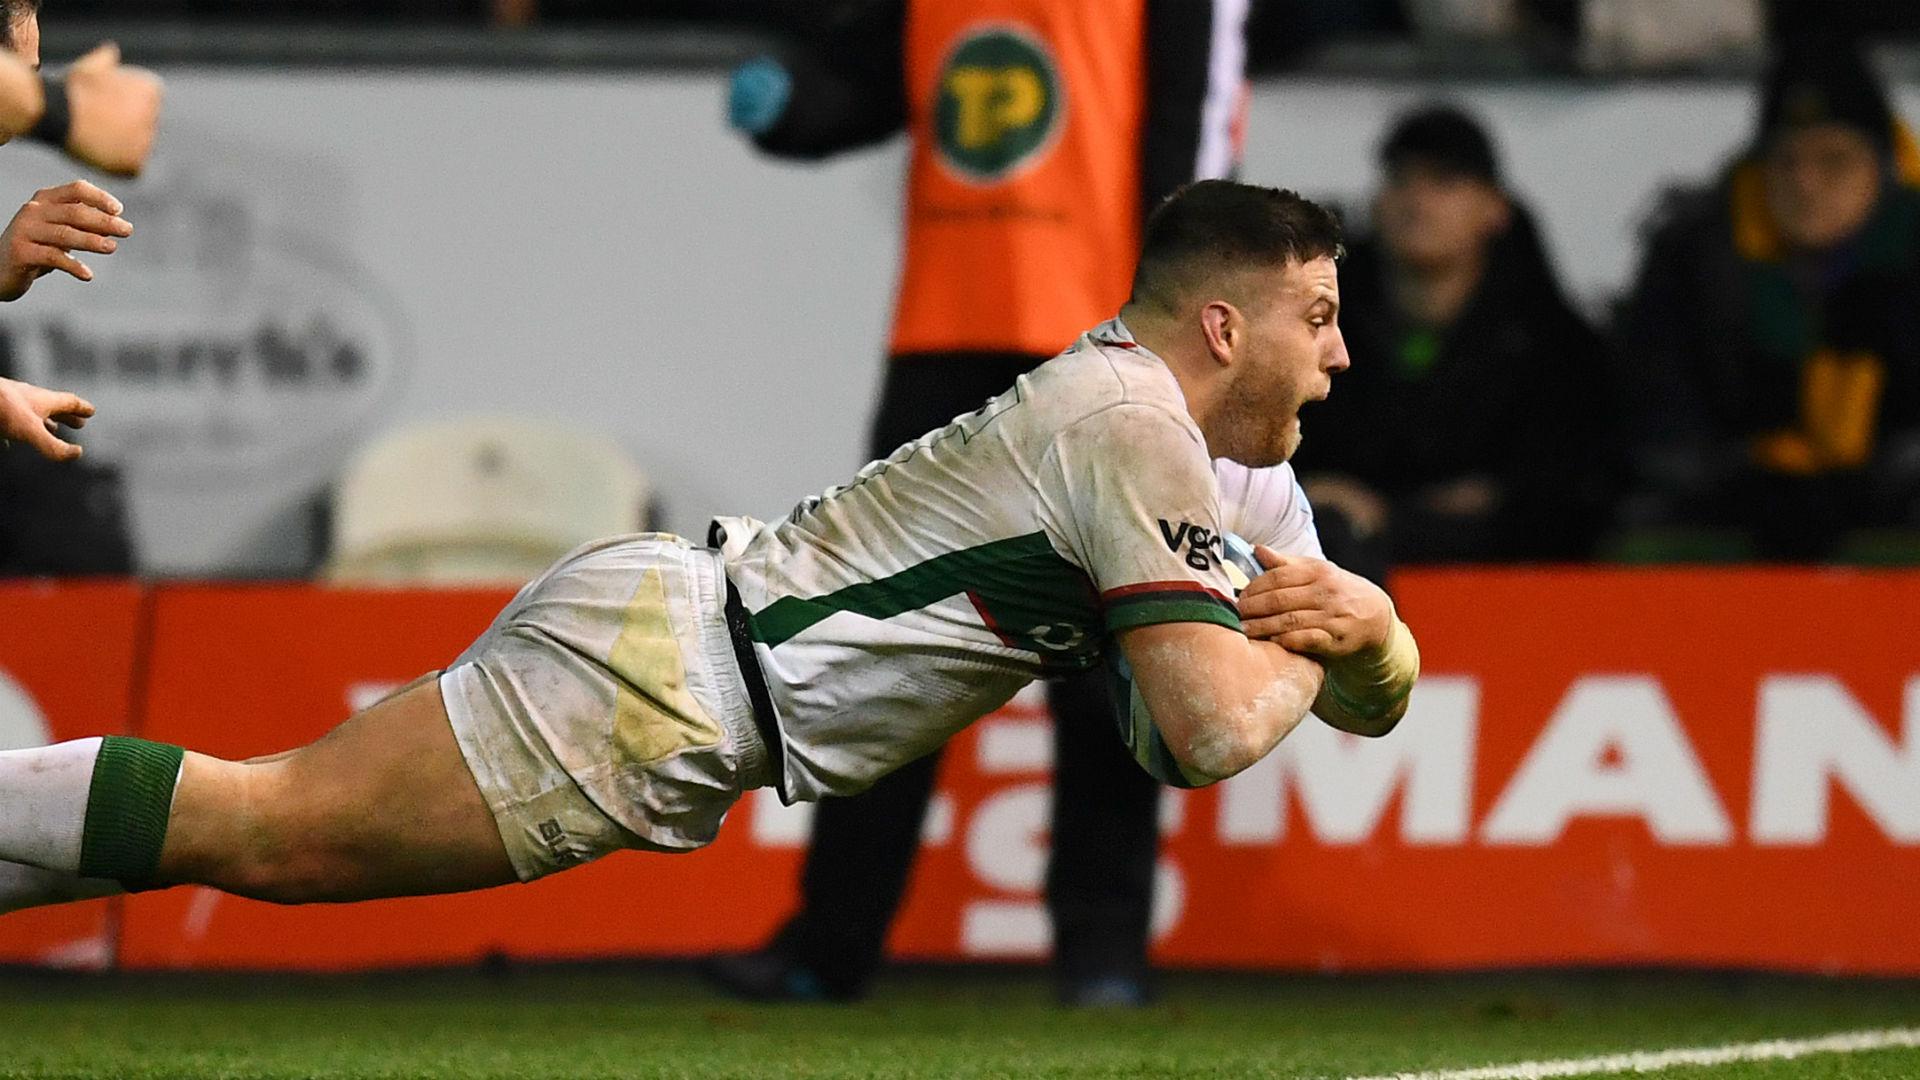 Northampton Saints looked to be heading top of the Premiership until London Irish sprung a shock following Api Ratuniyarawa's dismissal.